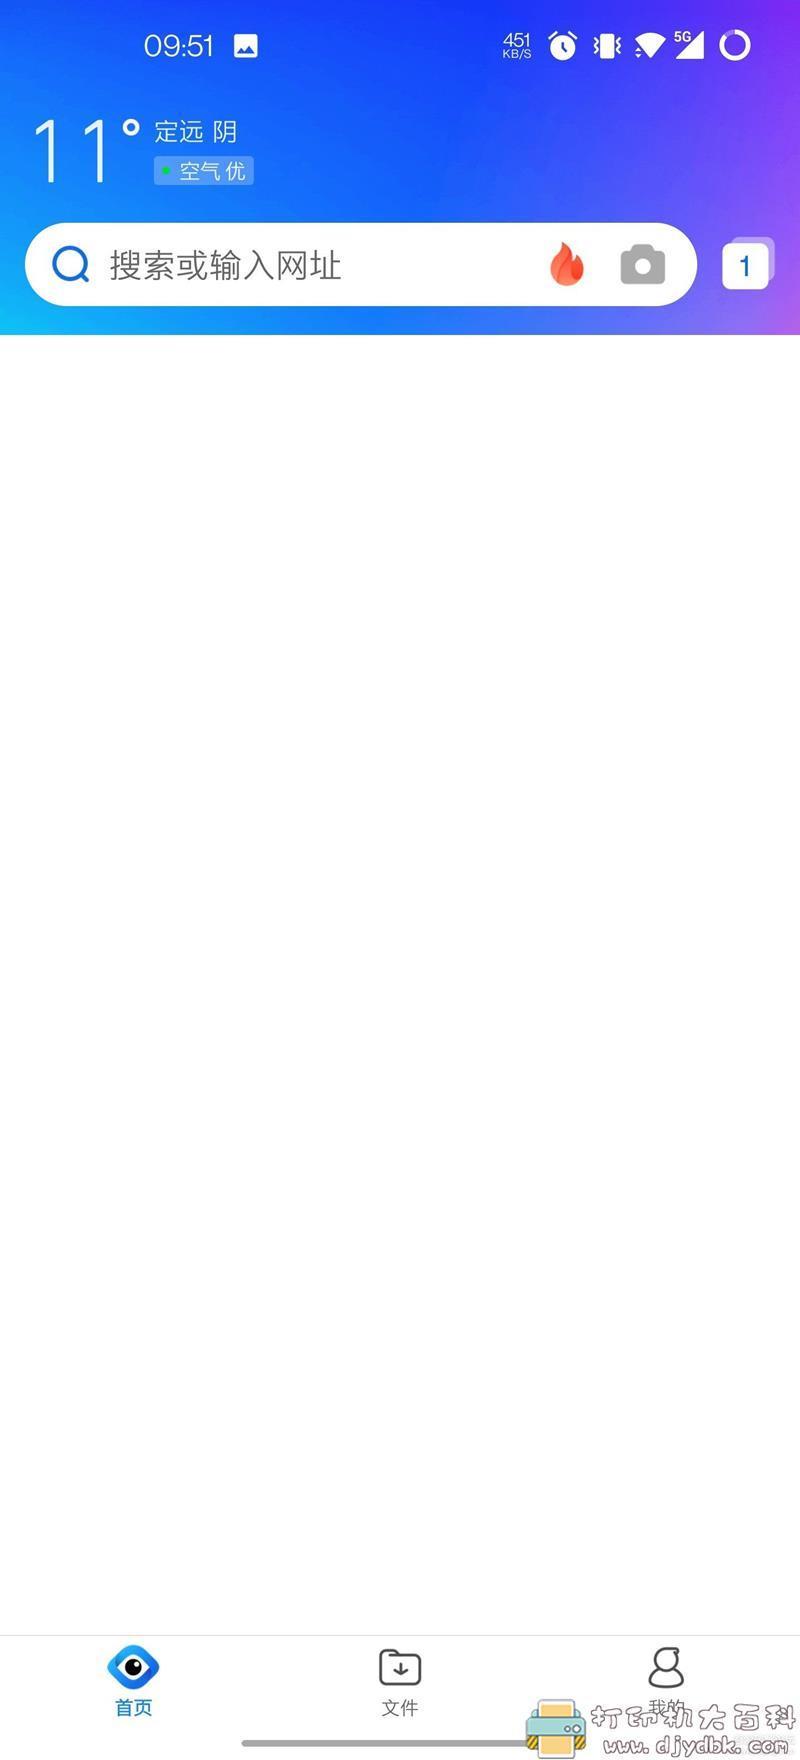 [Android]QQ浏览器_v11.3.5.5512,带资源嗅探,视频下载功能 配图 No.1